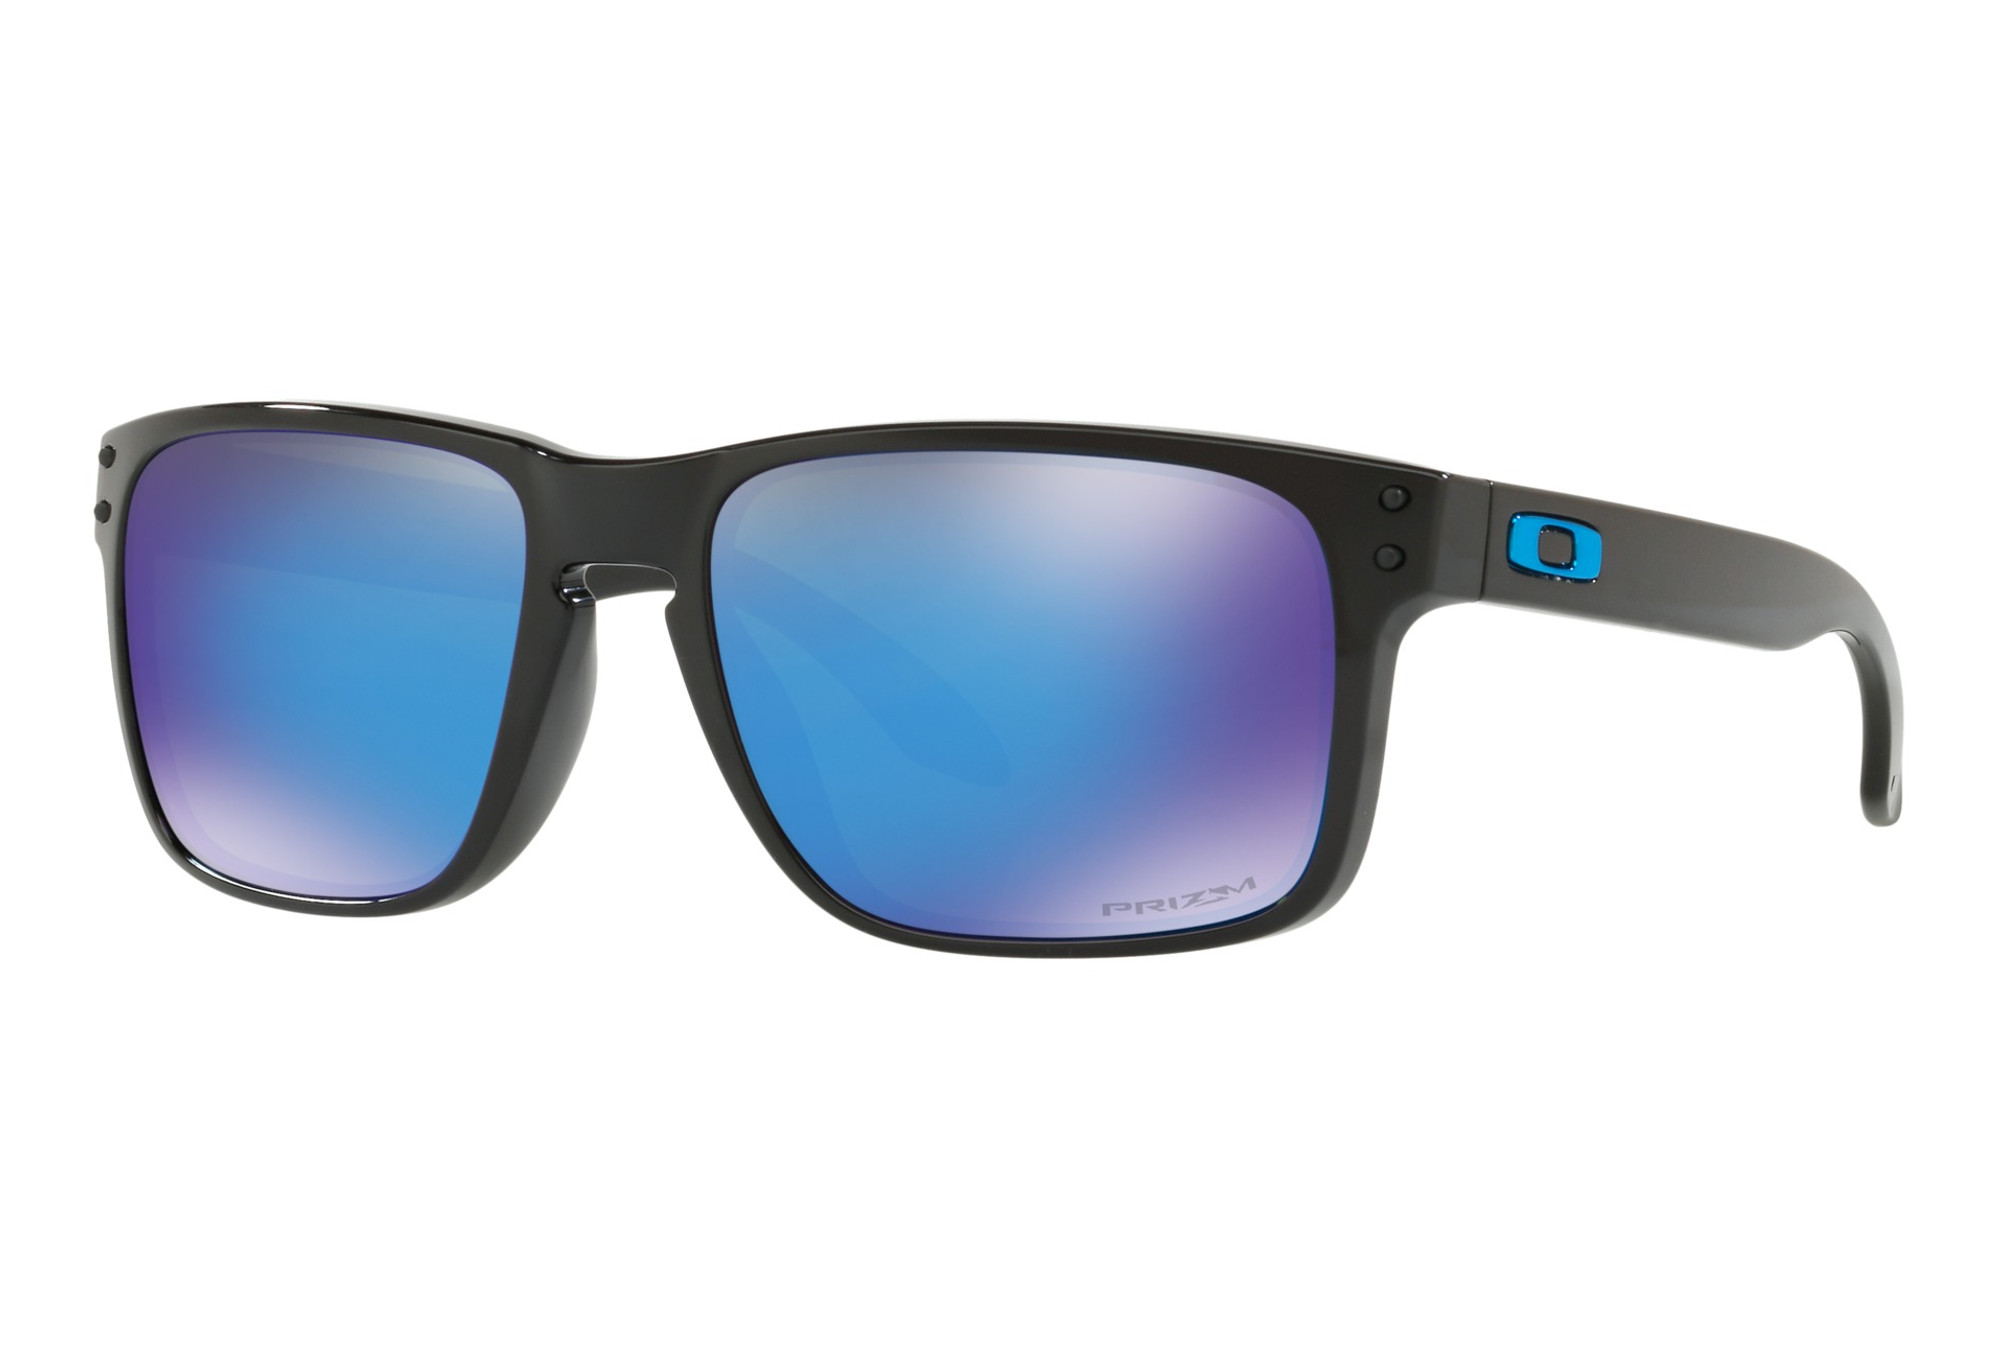 d008b73270 Gafas de sol Oakley Holbrook negras - Prizm Sapphire OO9102-F555 ...